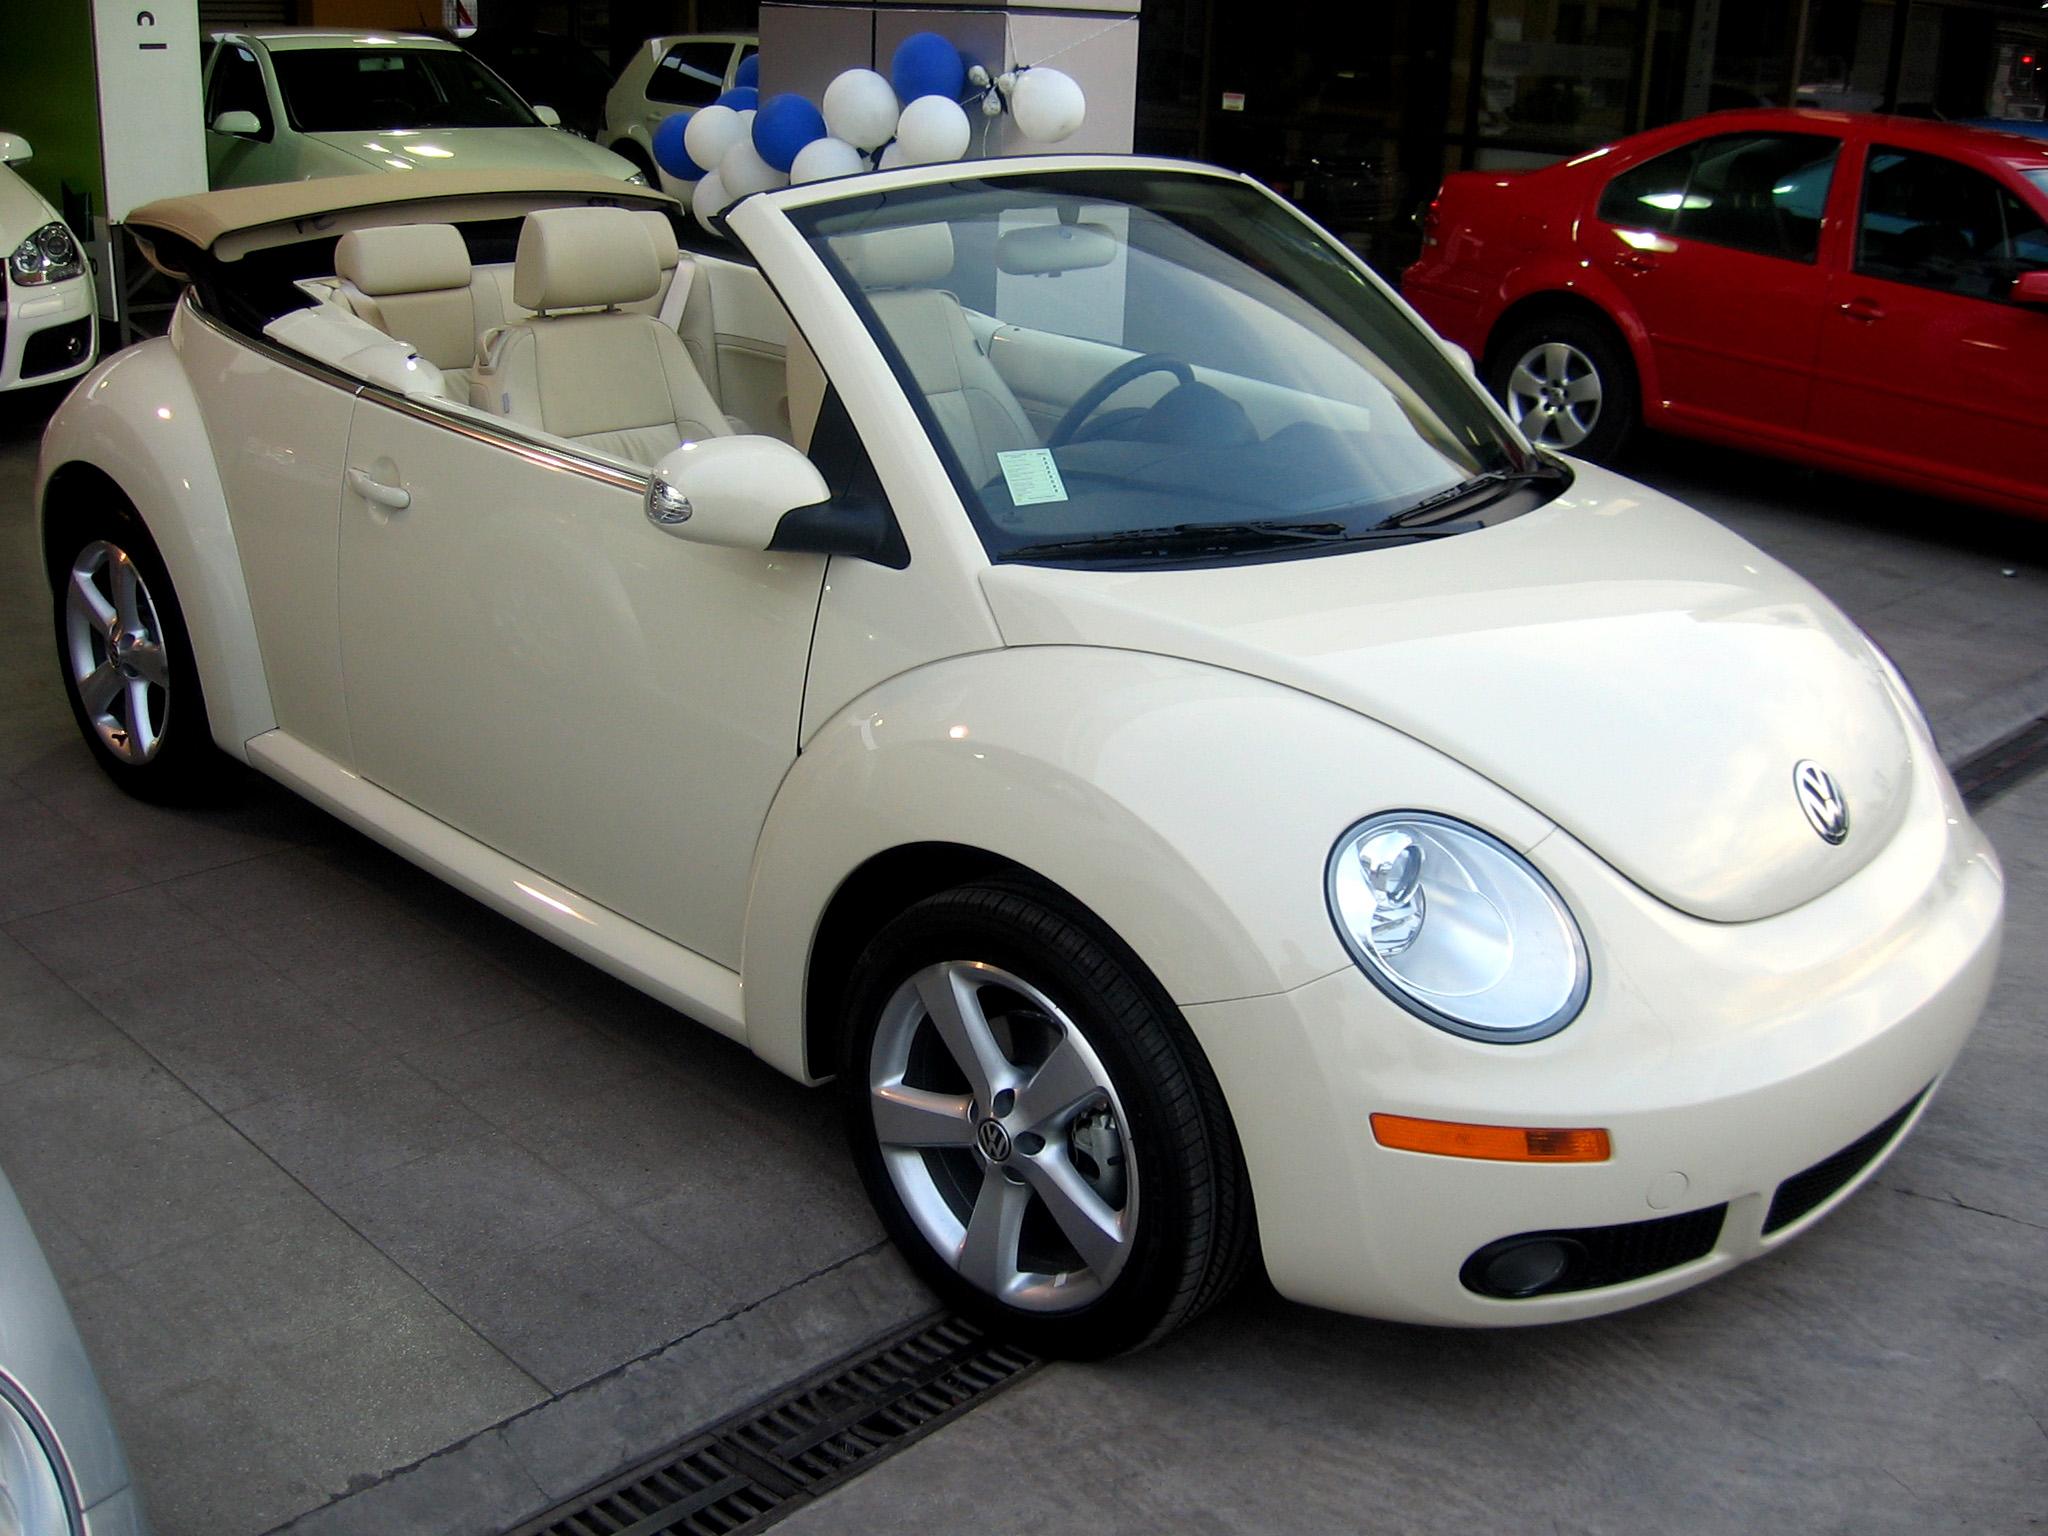 file volkswagen new beetle 2 5 sport cabriolet 2008 14701562694 jpg wikimedia commons. Black Bedroom Furniture Sets. Home Design Ideas